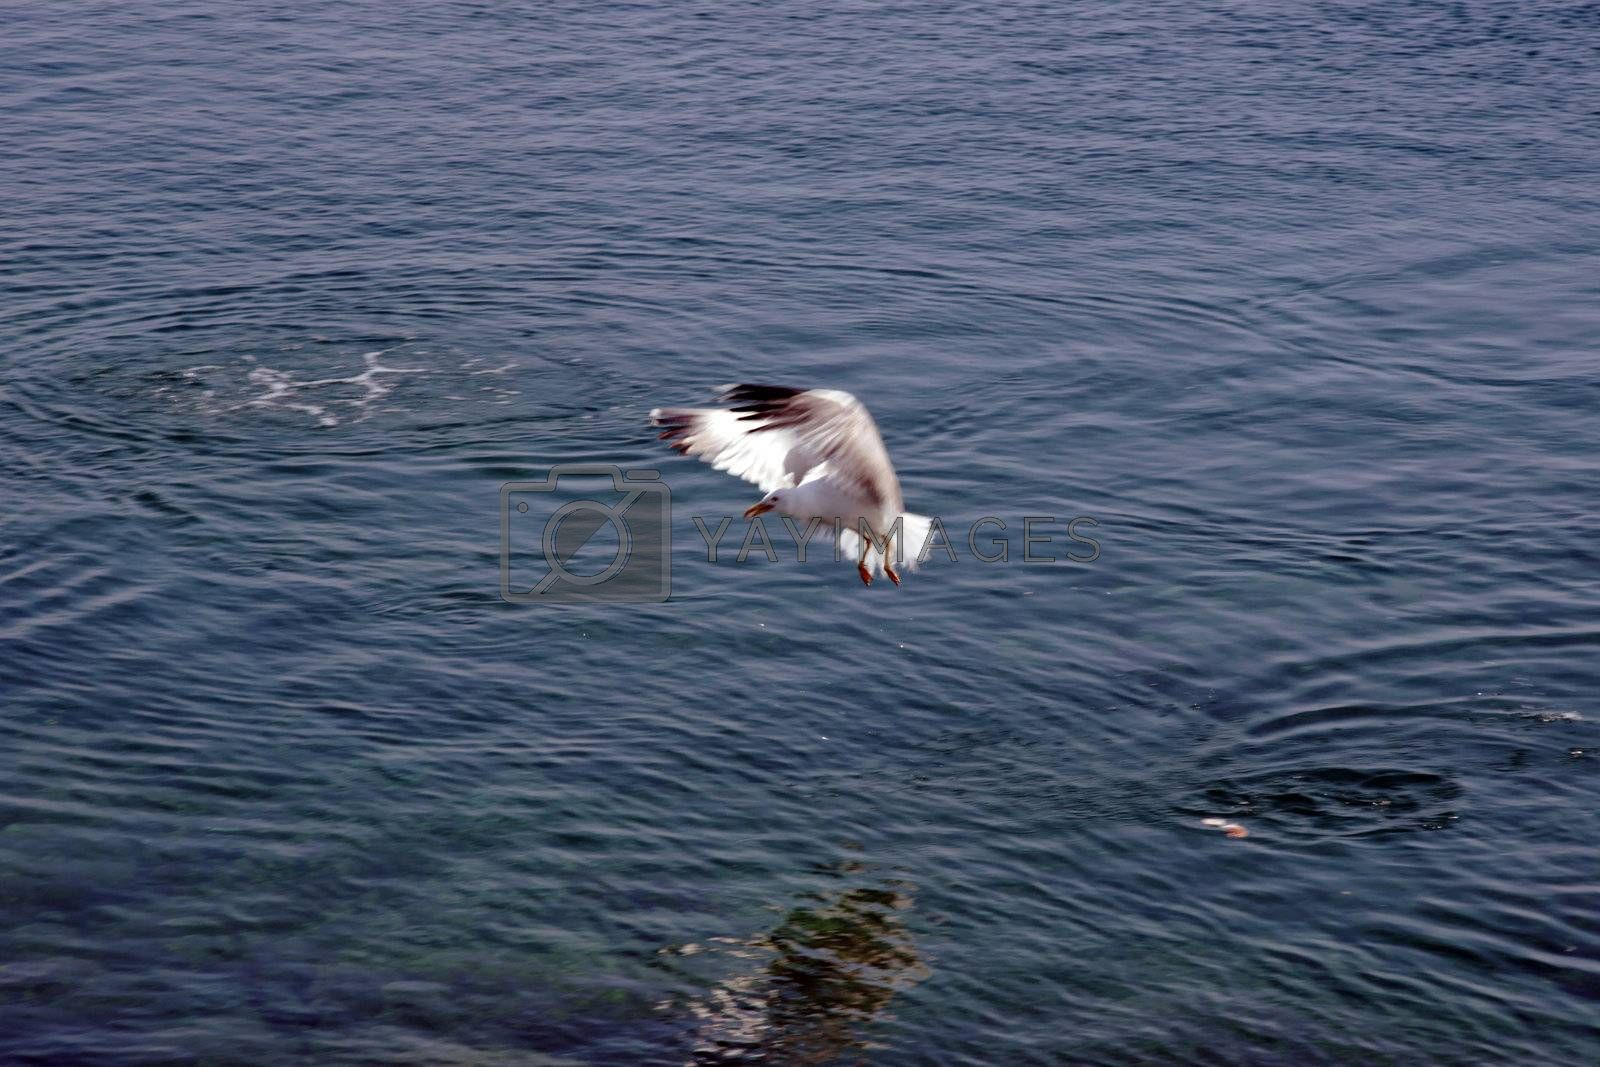 splash down by morrbyte